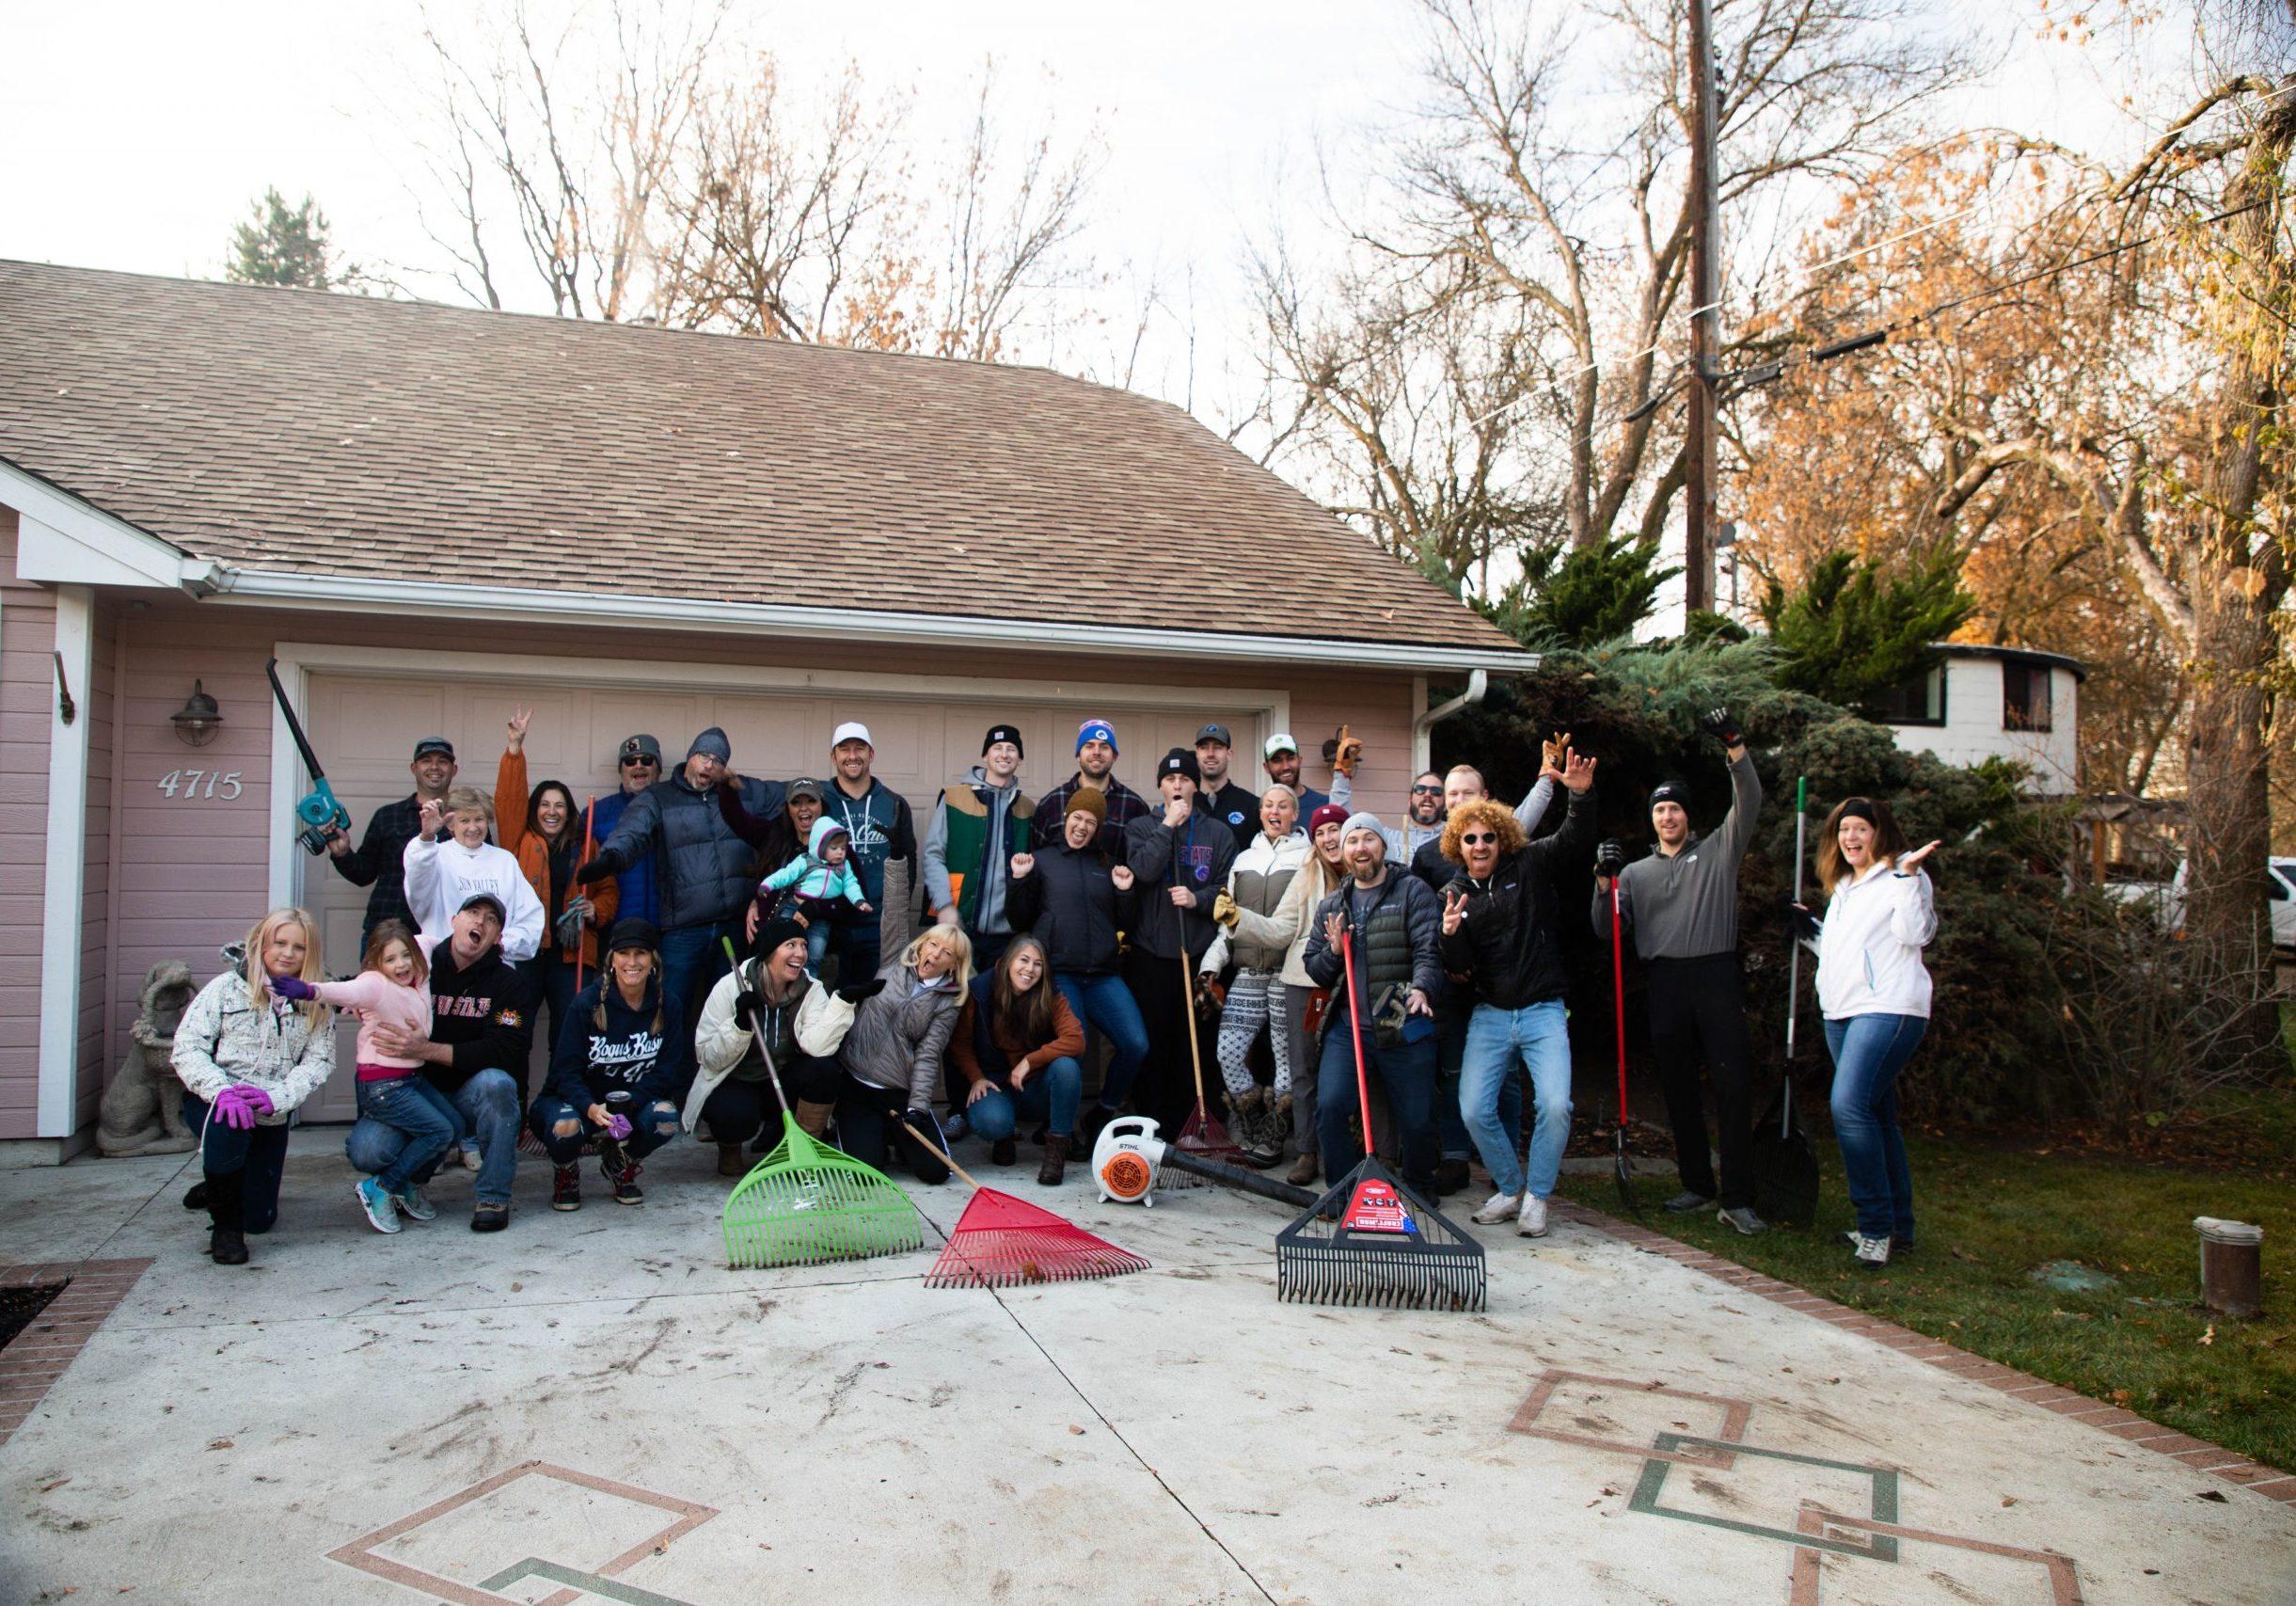 35th Annual Rake Up Boise Event